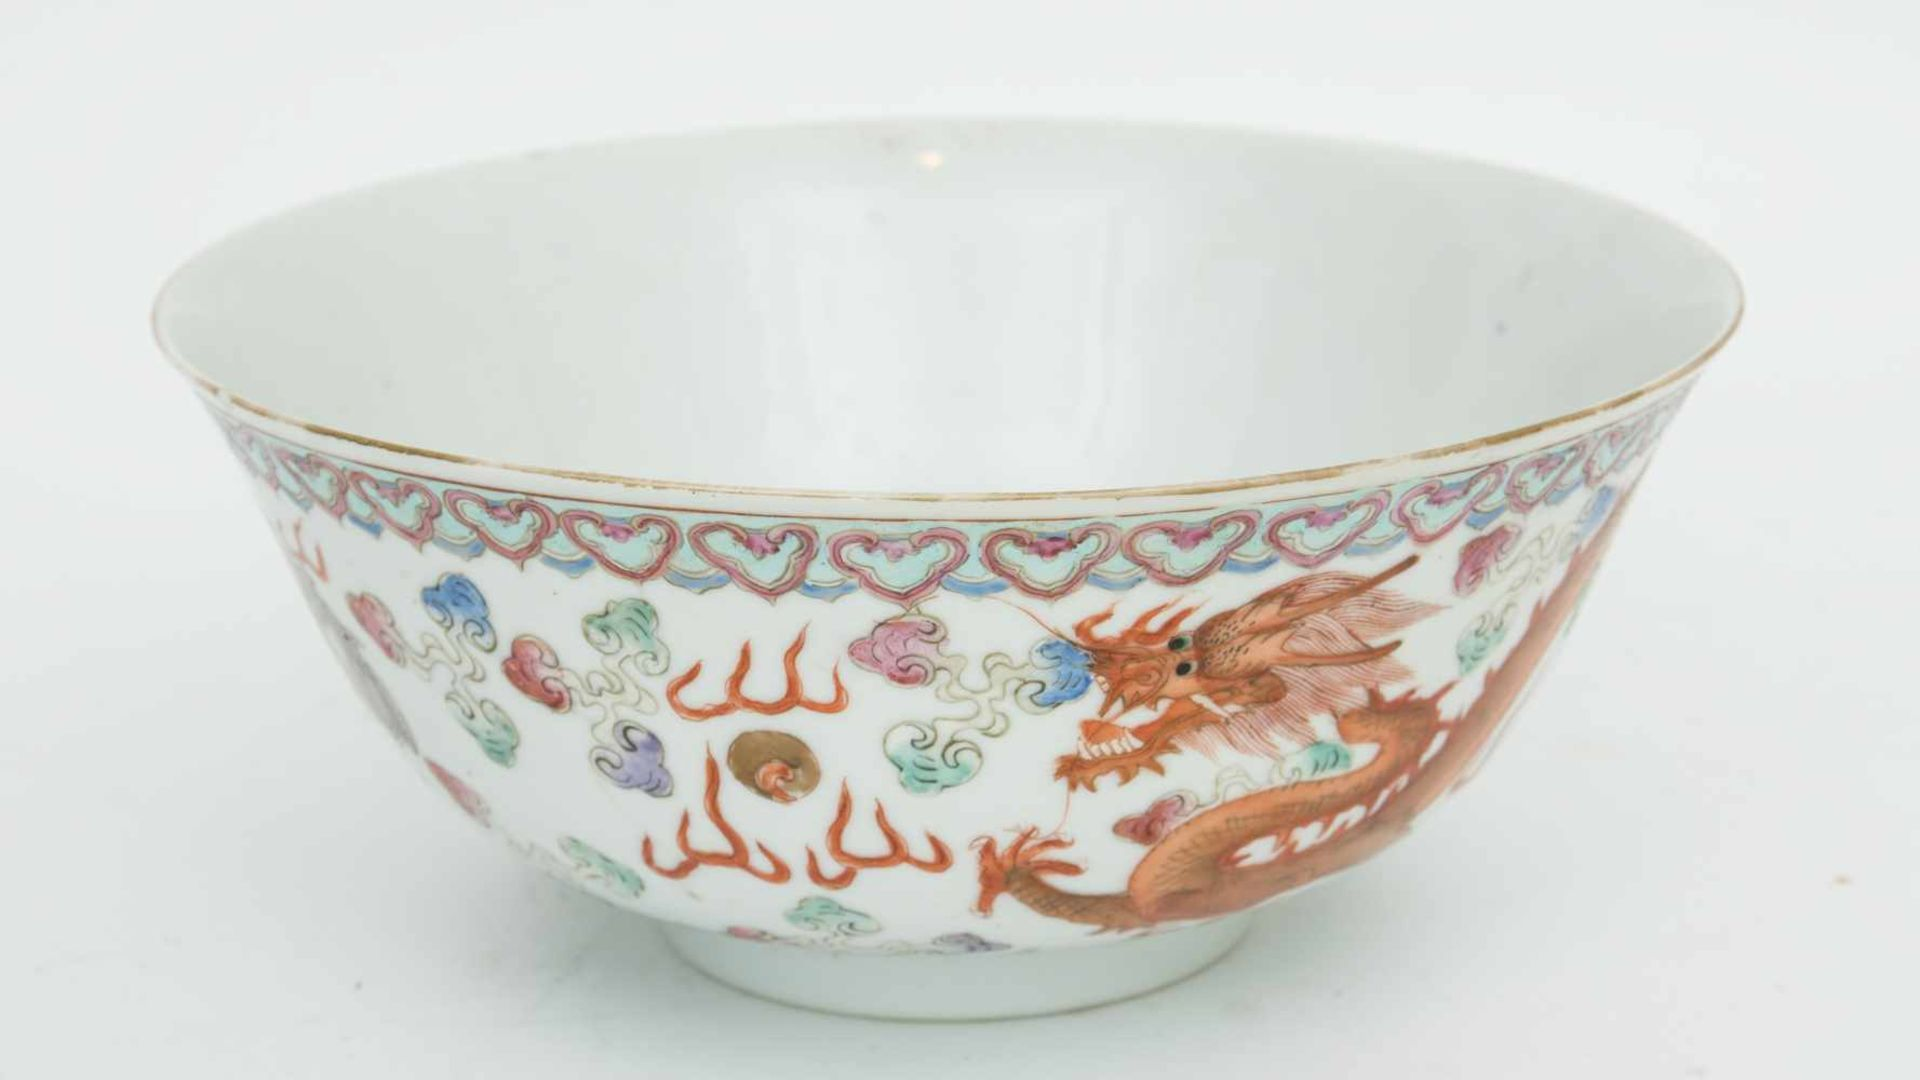 Los 2 - PORZELLANSCHÄLCHEN, Republic of China, Hongxian (1915-1916) Schälchen aus Porzellan,dekoriert mit